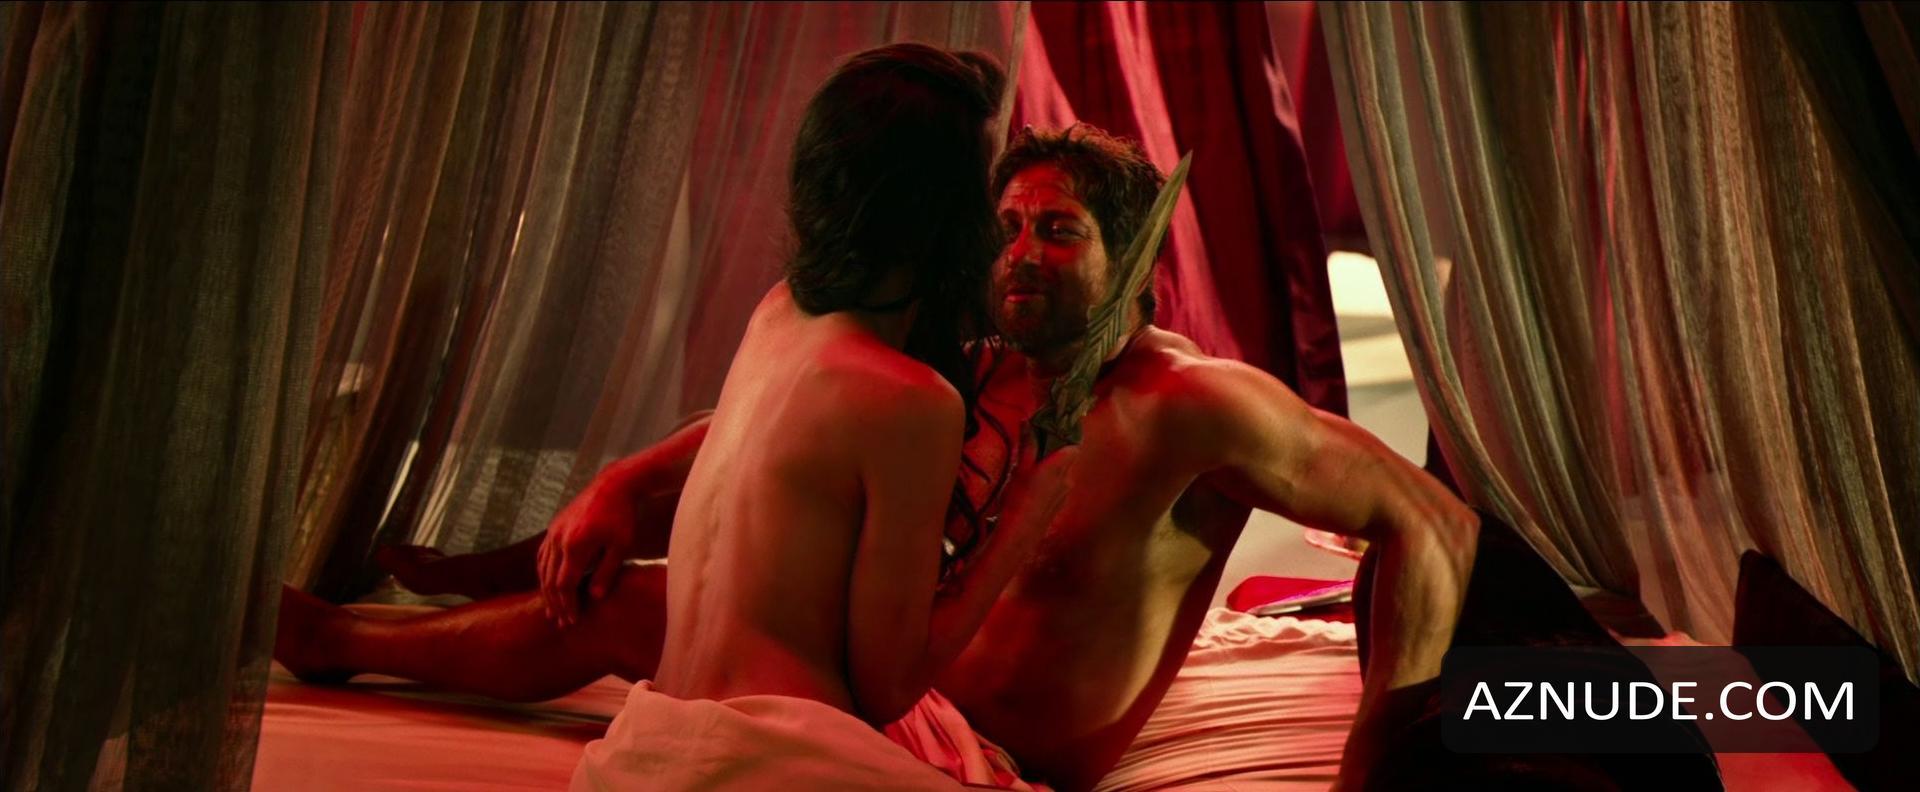 Gods Of Egypt Nude Scenes - Aznude-3136